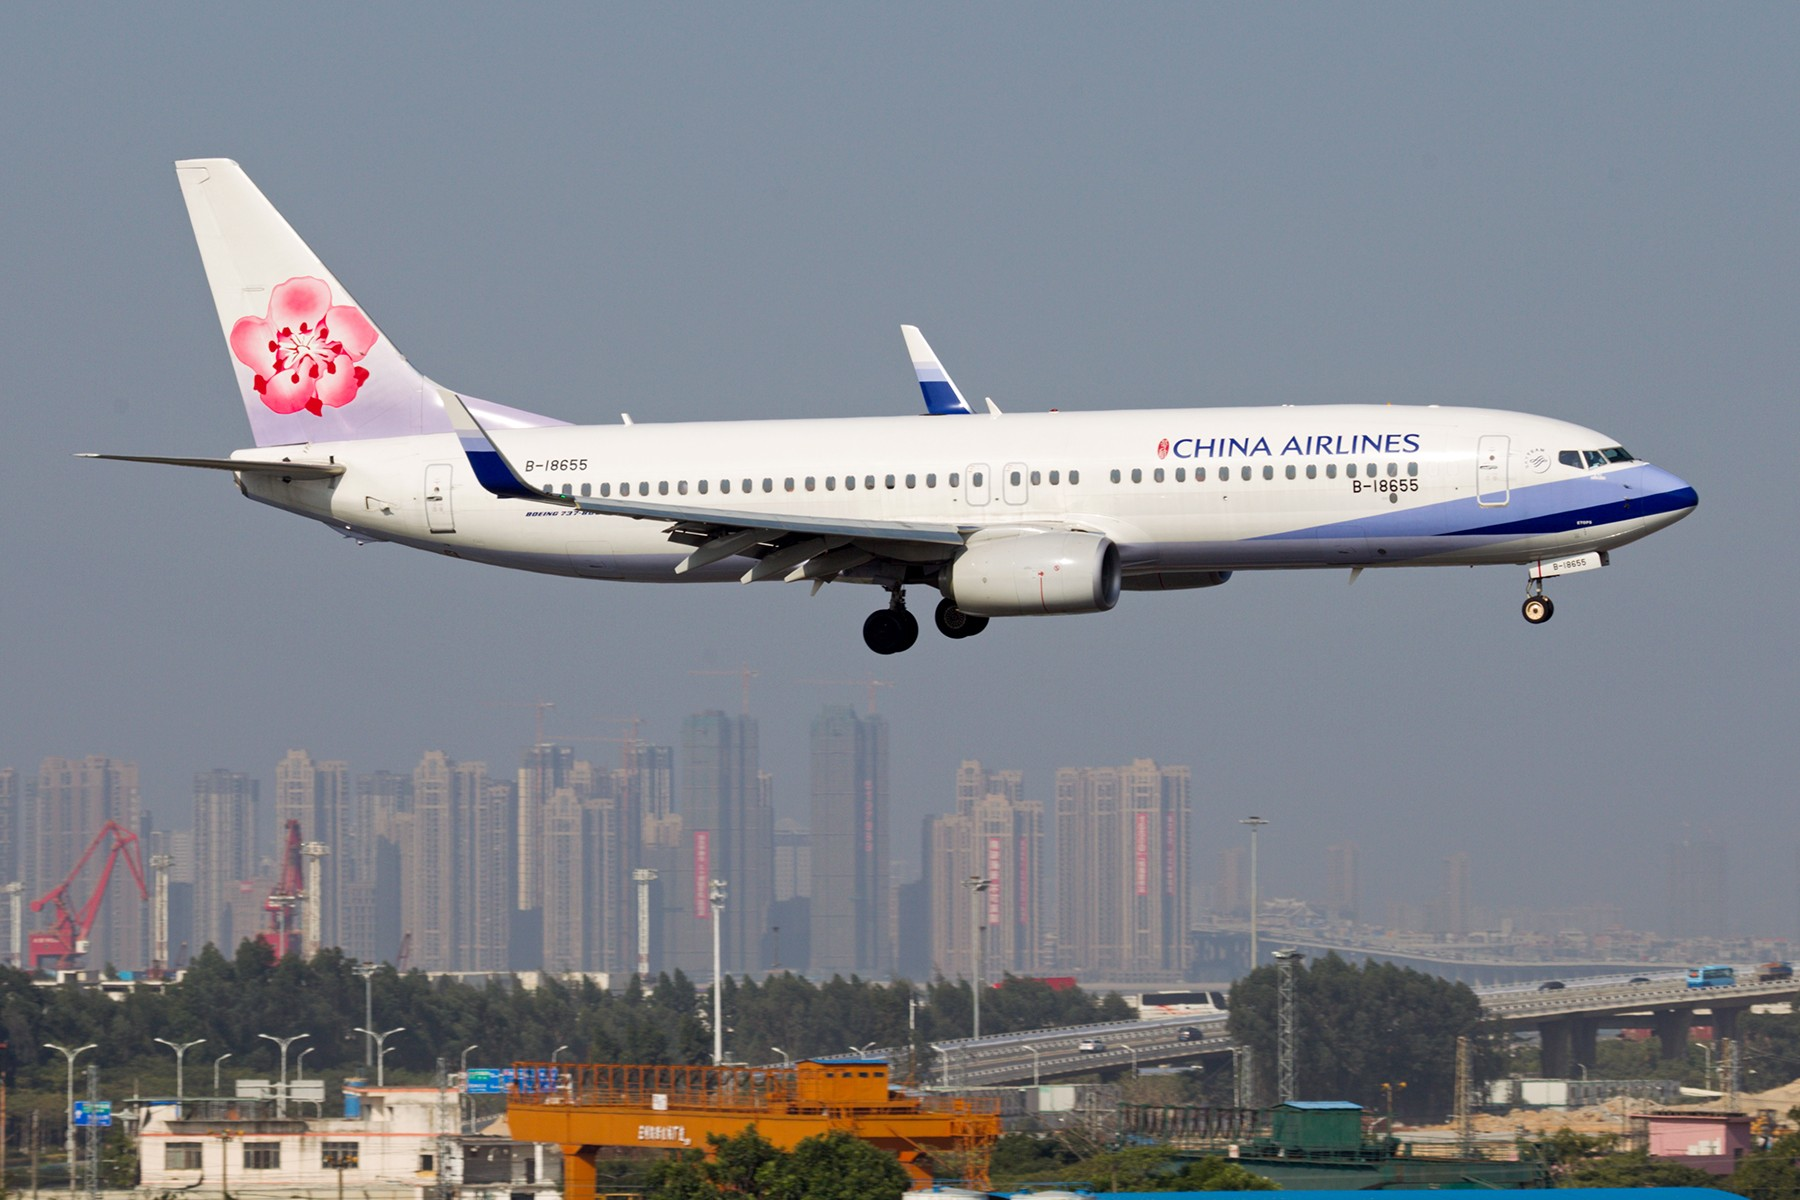 Re:【BLDDQ拖面条】******论坛贴图信息已恢复,大家可以正常发帖了****** BOEING 737-800 B-18655 中国厦门高崎国际机场